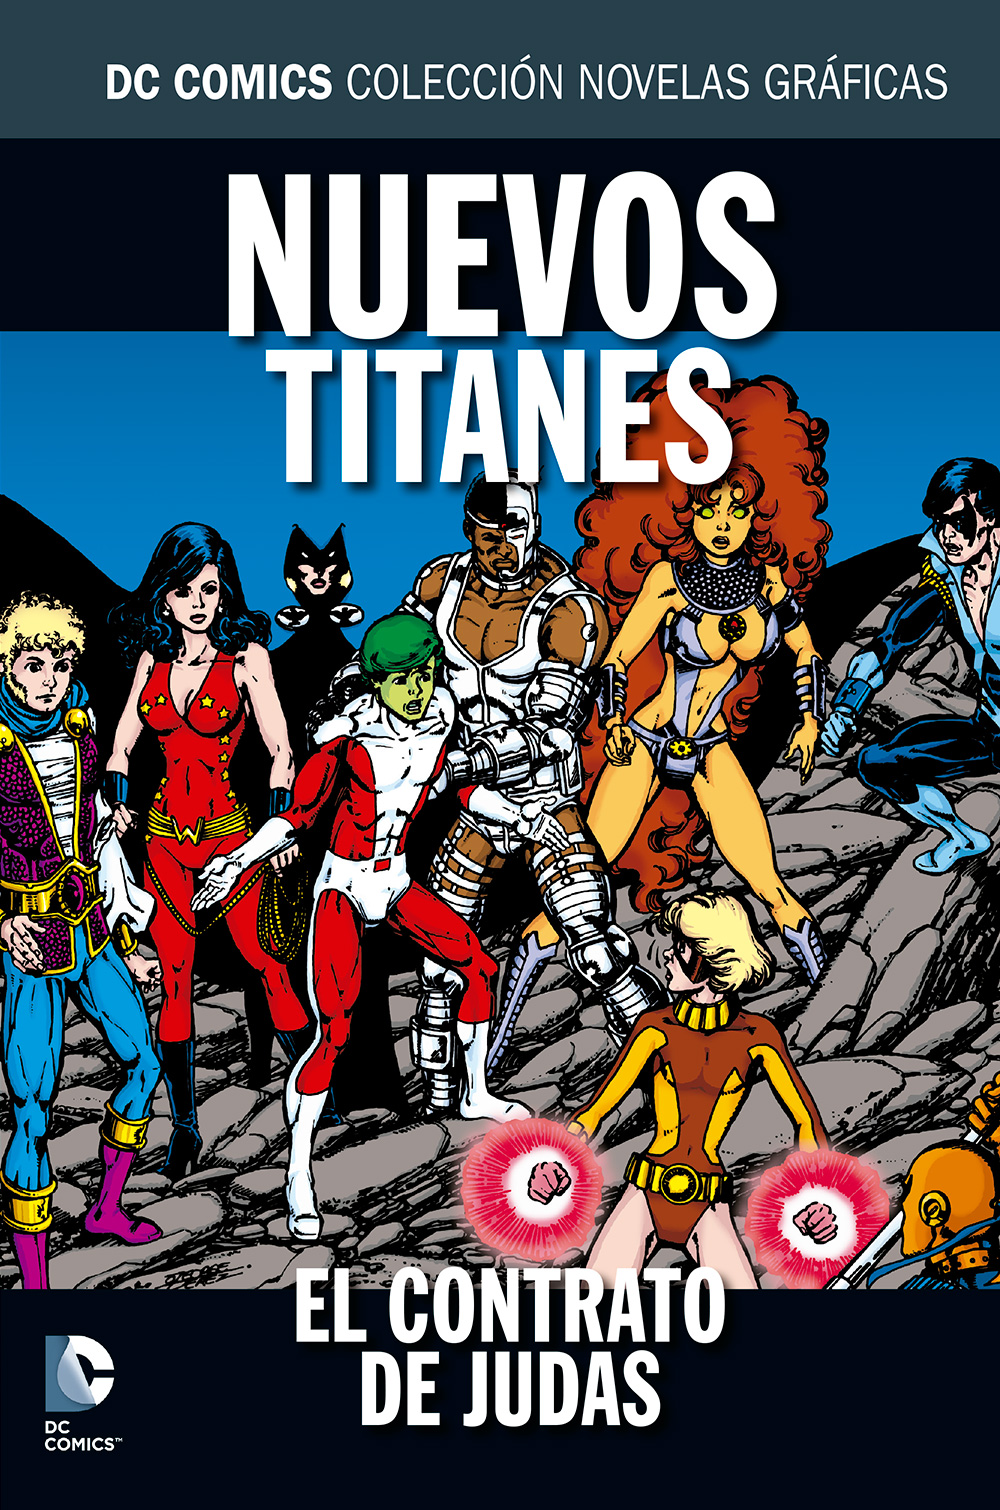 836 - [DC - Salvat] La Colección de Novelas Gráficas de DC Comics  SF118_026_01_001